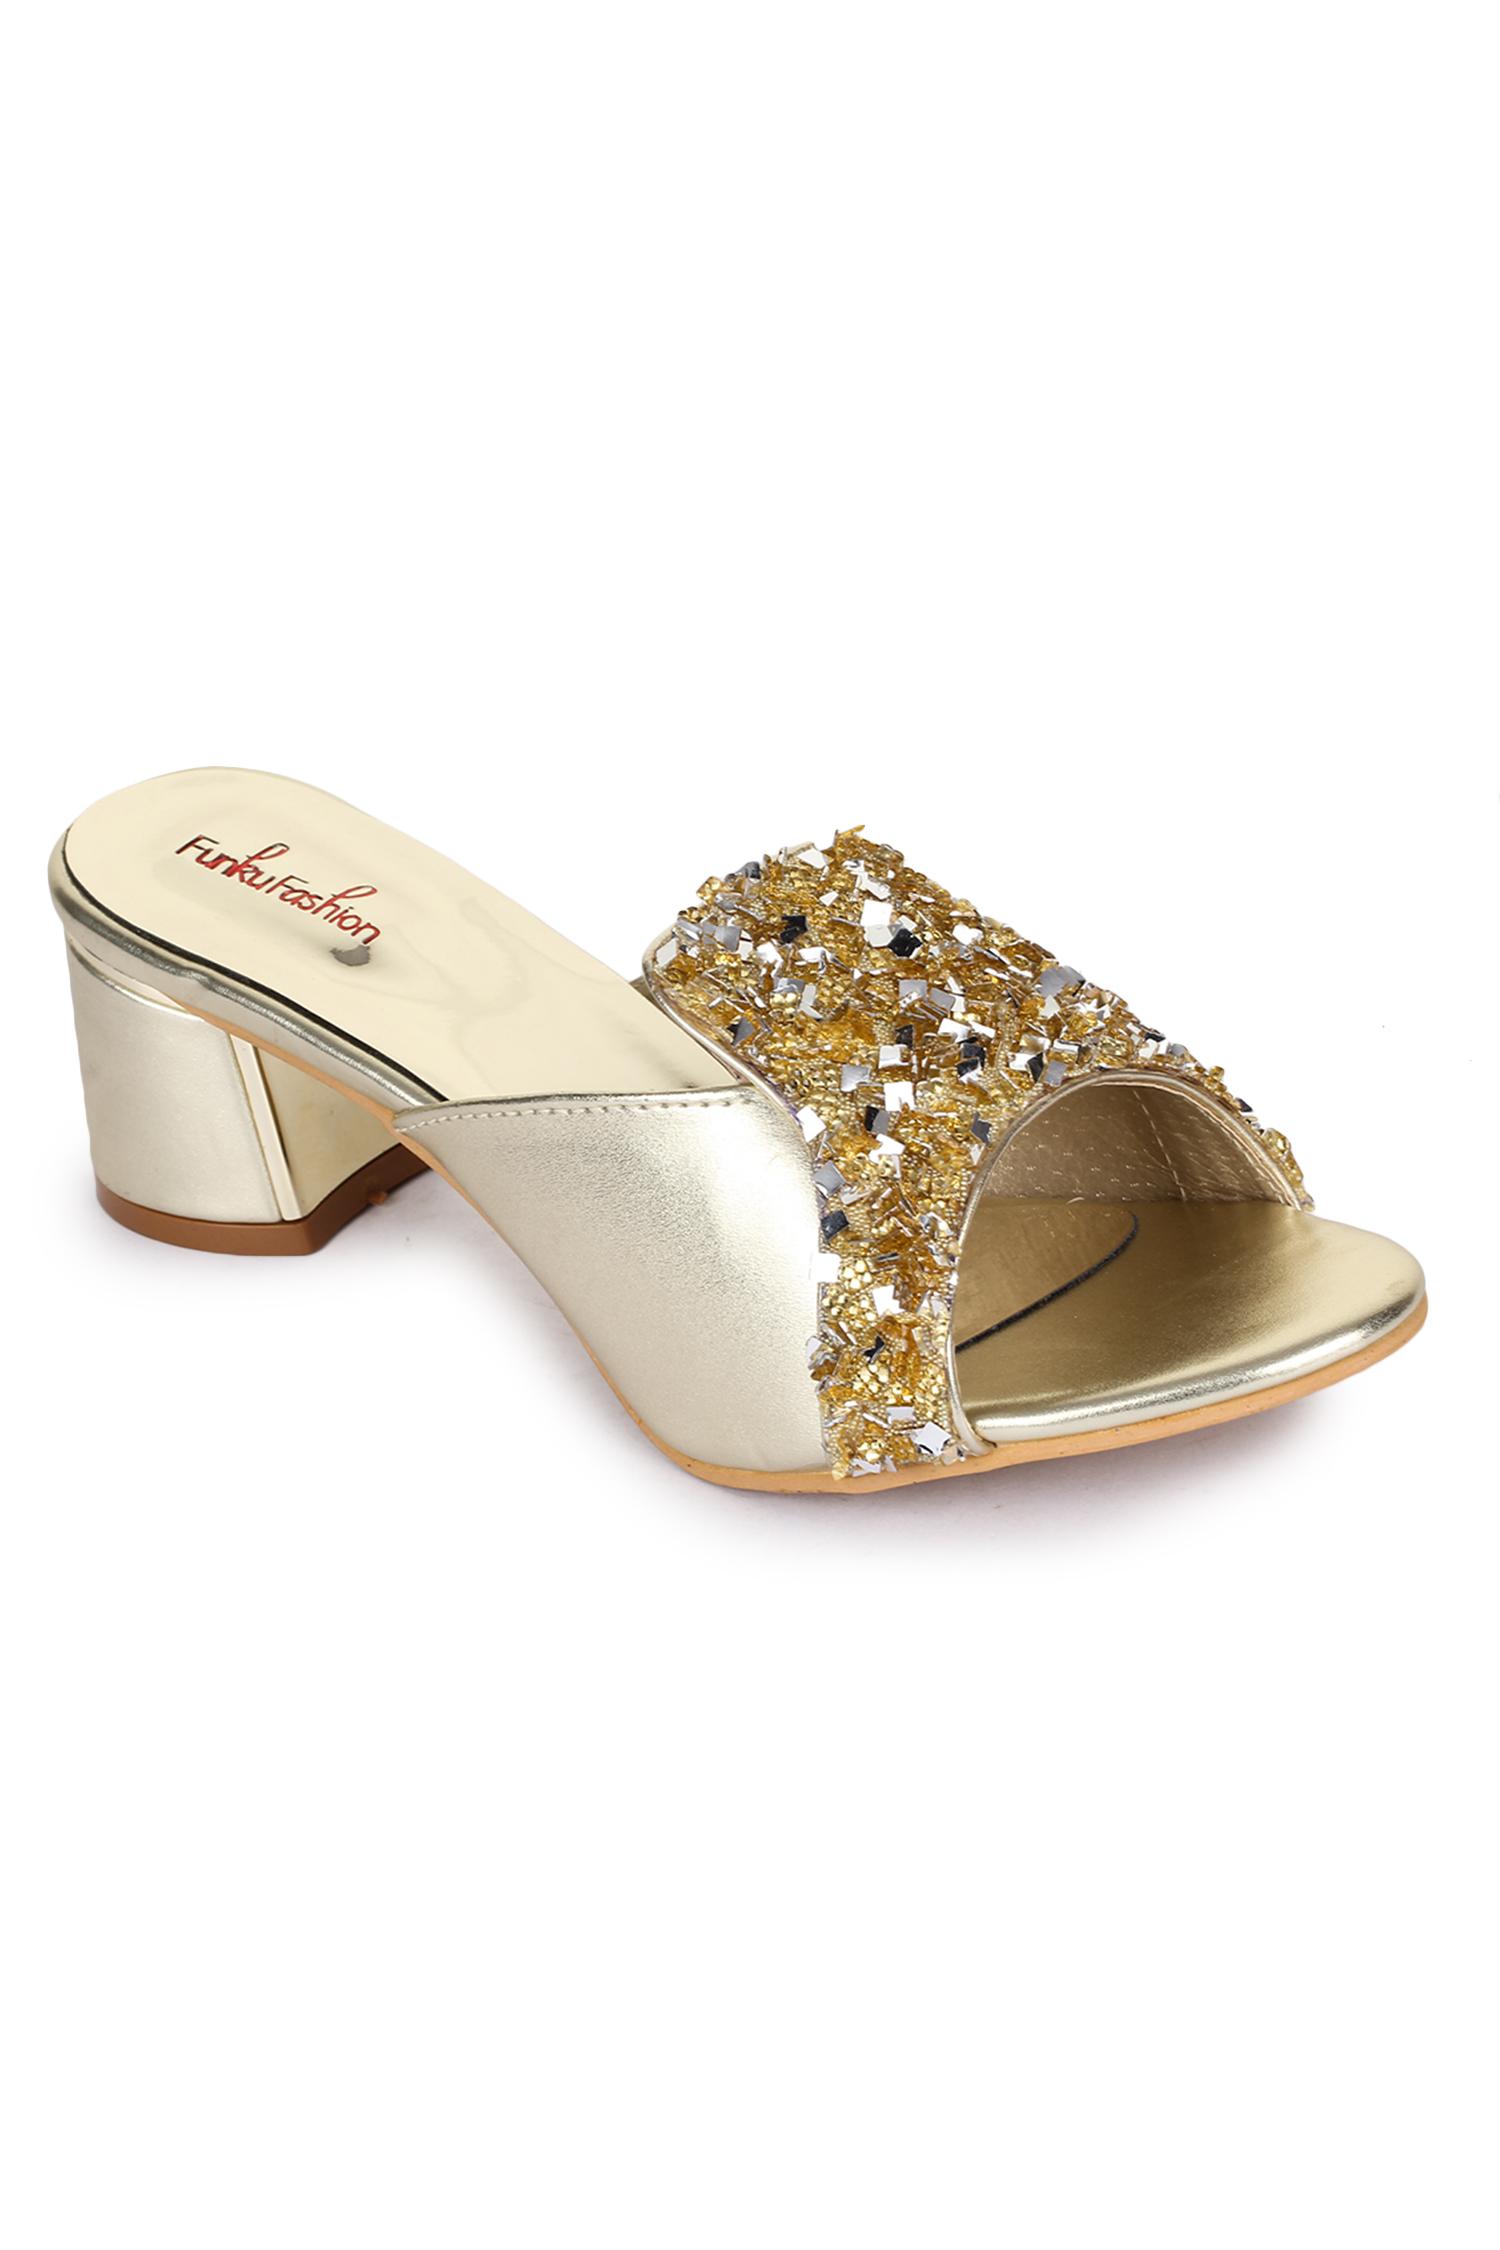 Funku Fashion Women Golden Block Heels